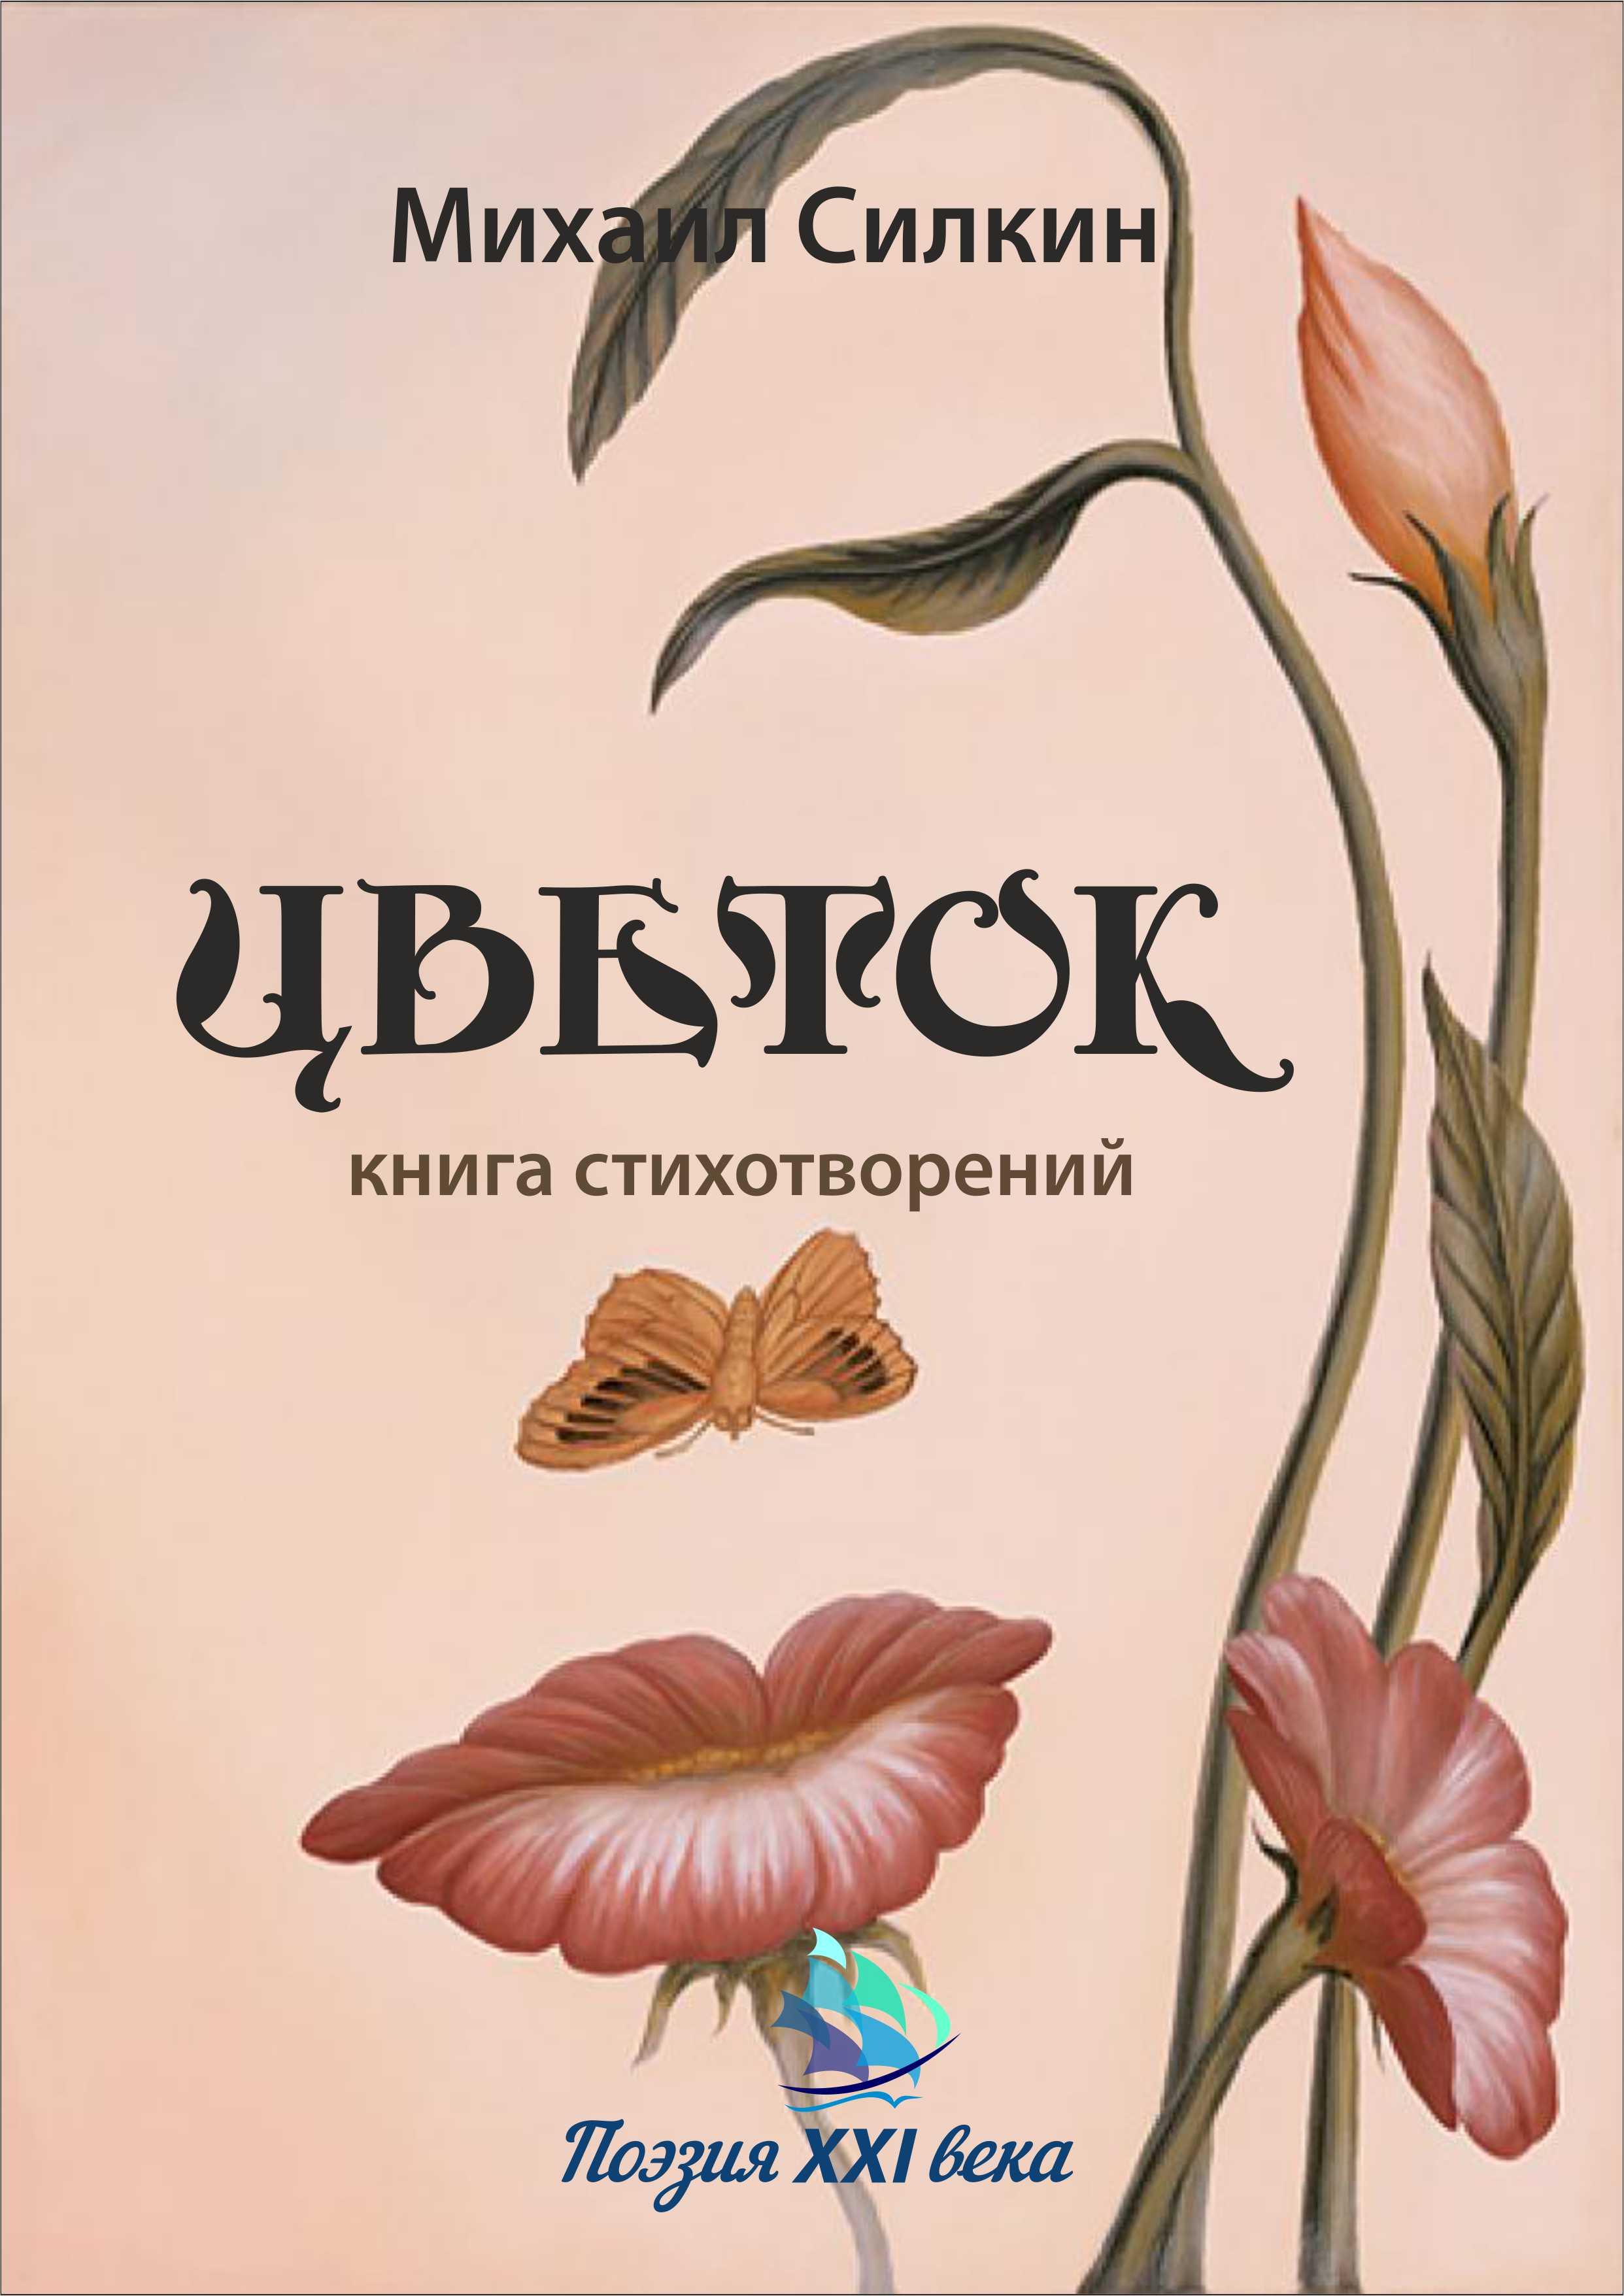 Михаил Силкин Цветок. Книга стихотворений тени чернобыля книга